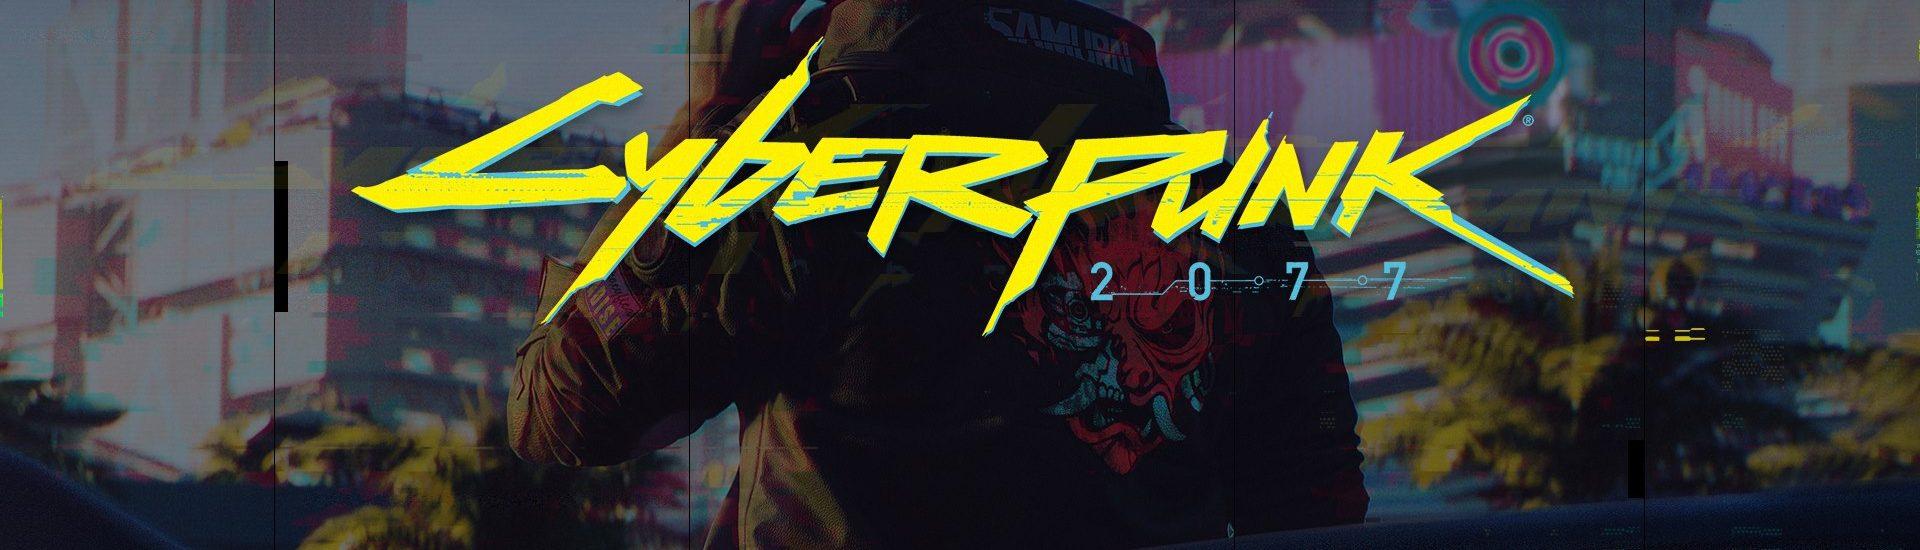 Cyberpunk 2077 de CD Projekt Red